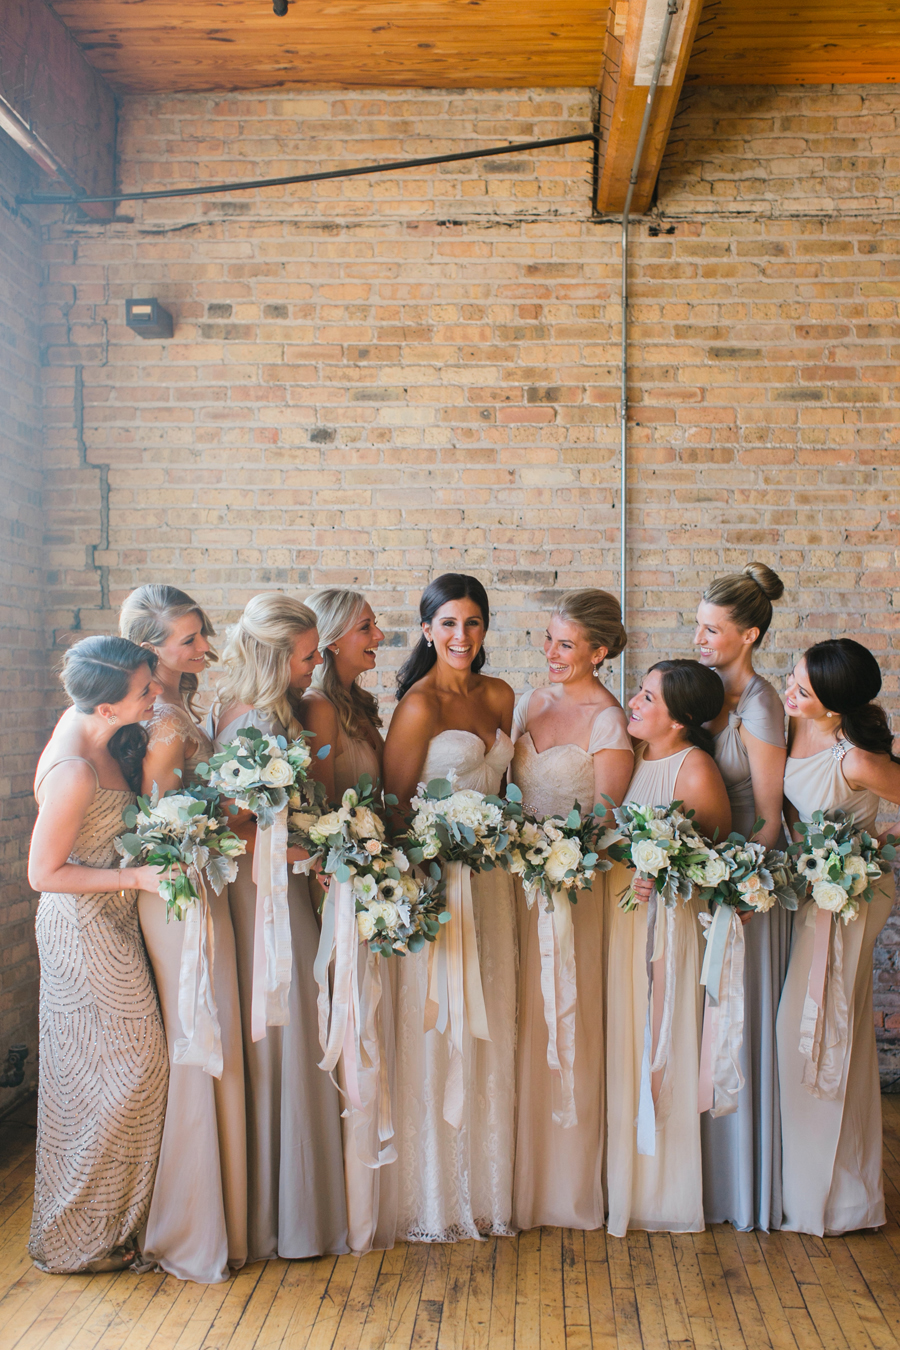 artistrie-co-best-wedding-photos-2015-003